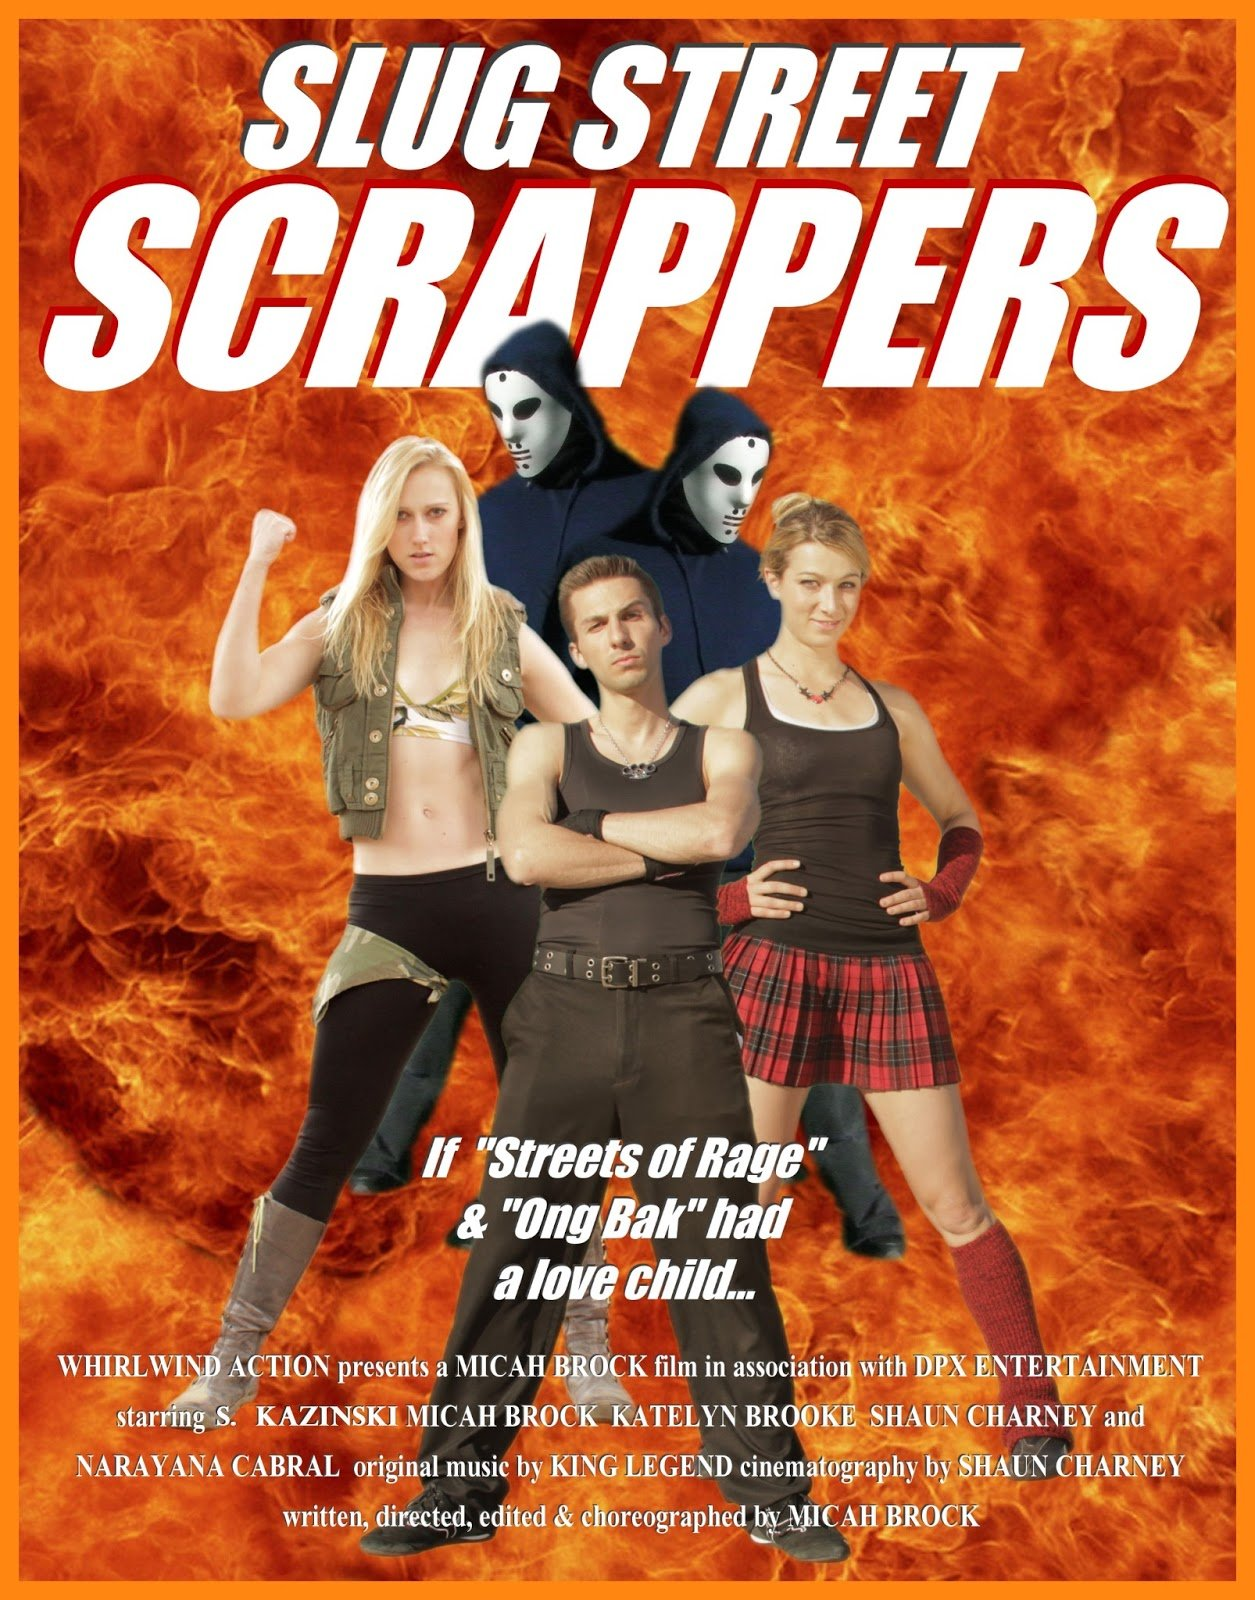 Slug Street Scrappers